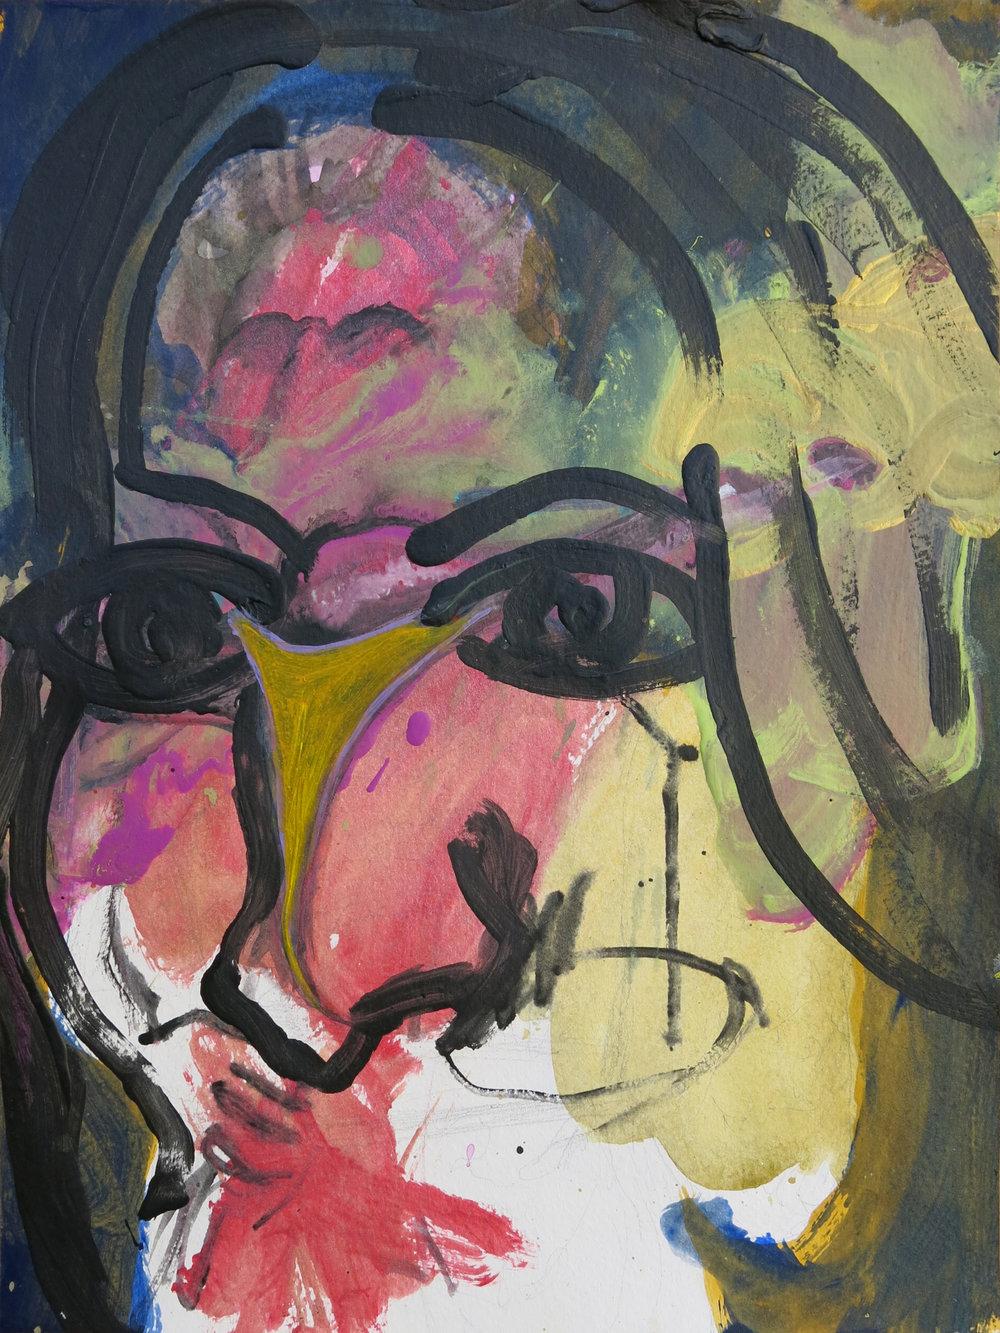 Barbra Streisand Portrait #223